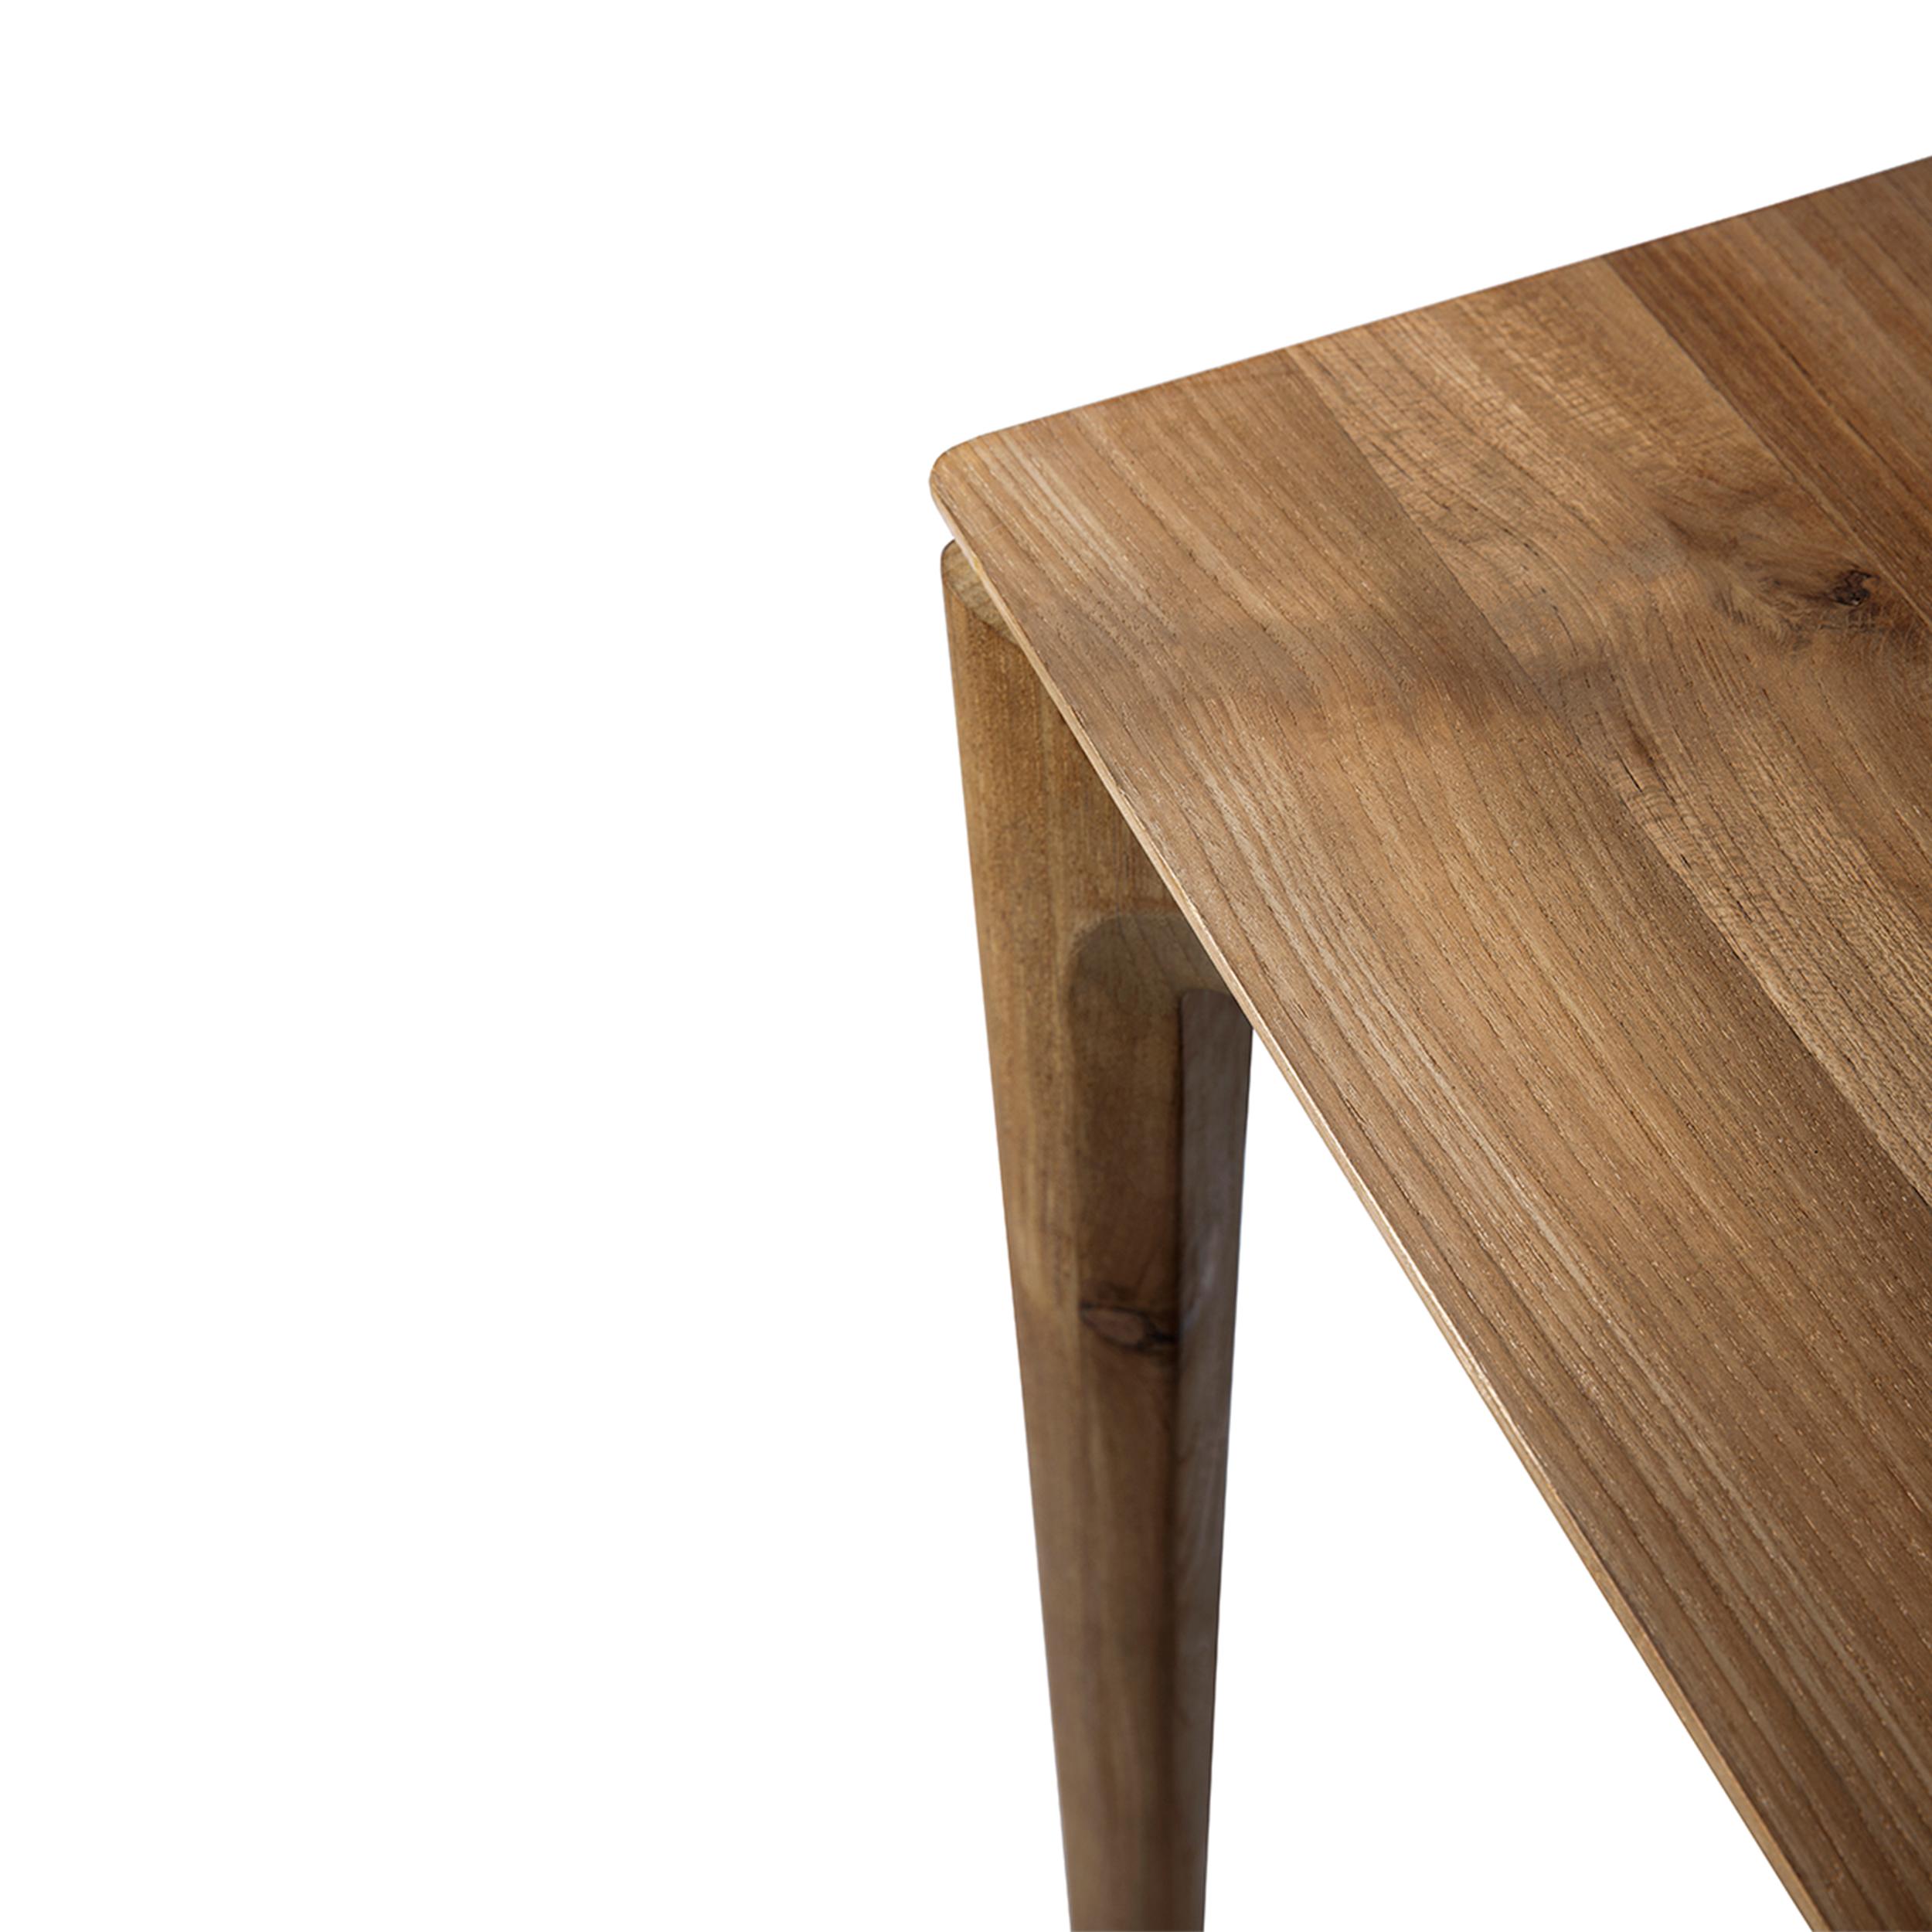 10162 Teak Bok dining table detail (3).jpg.png